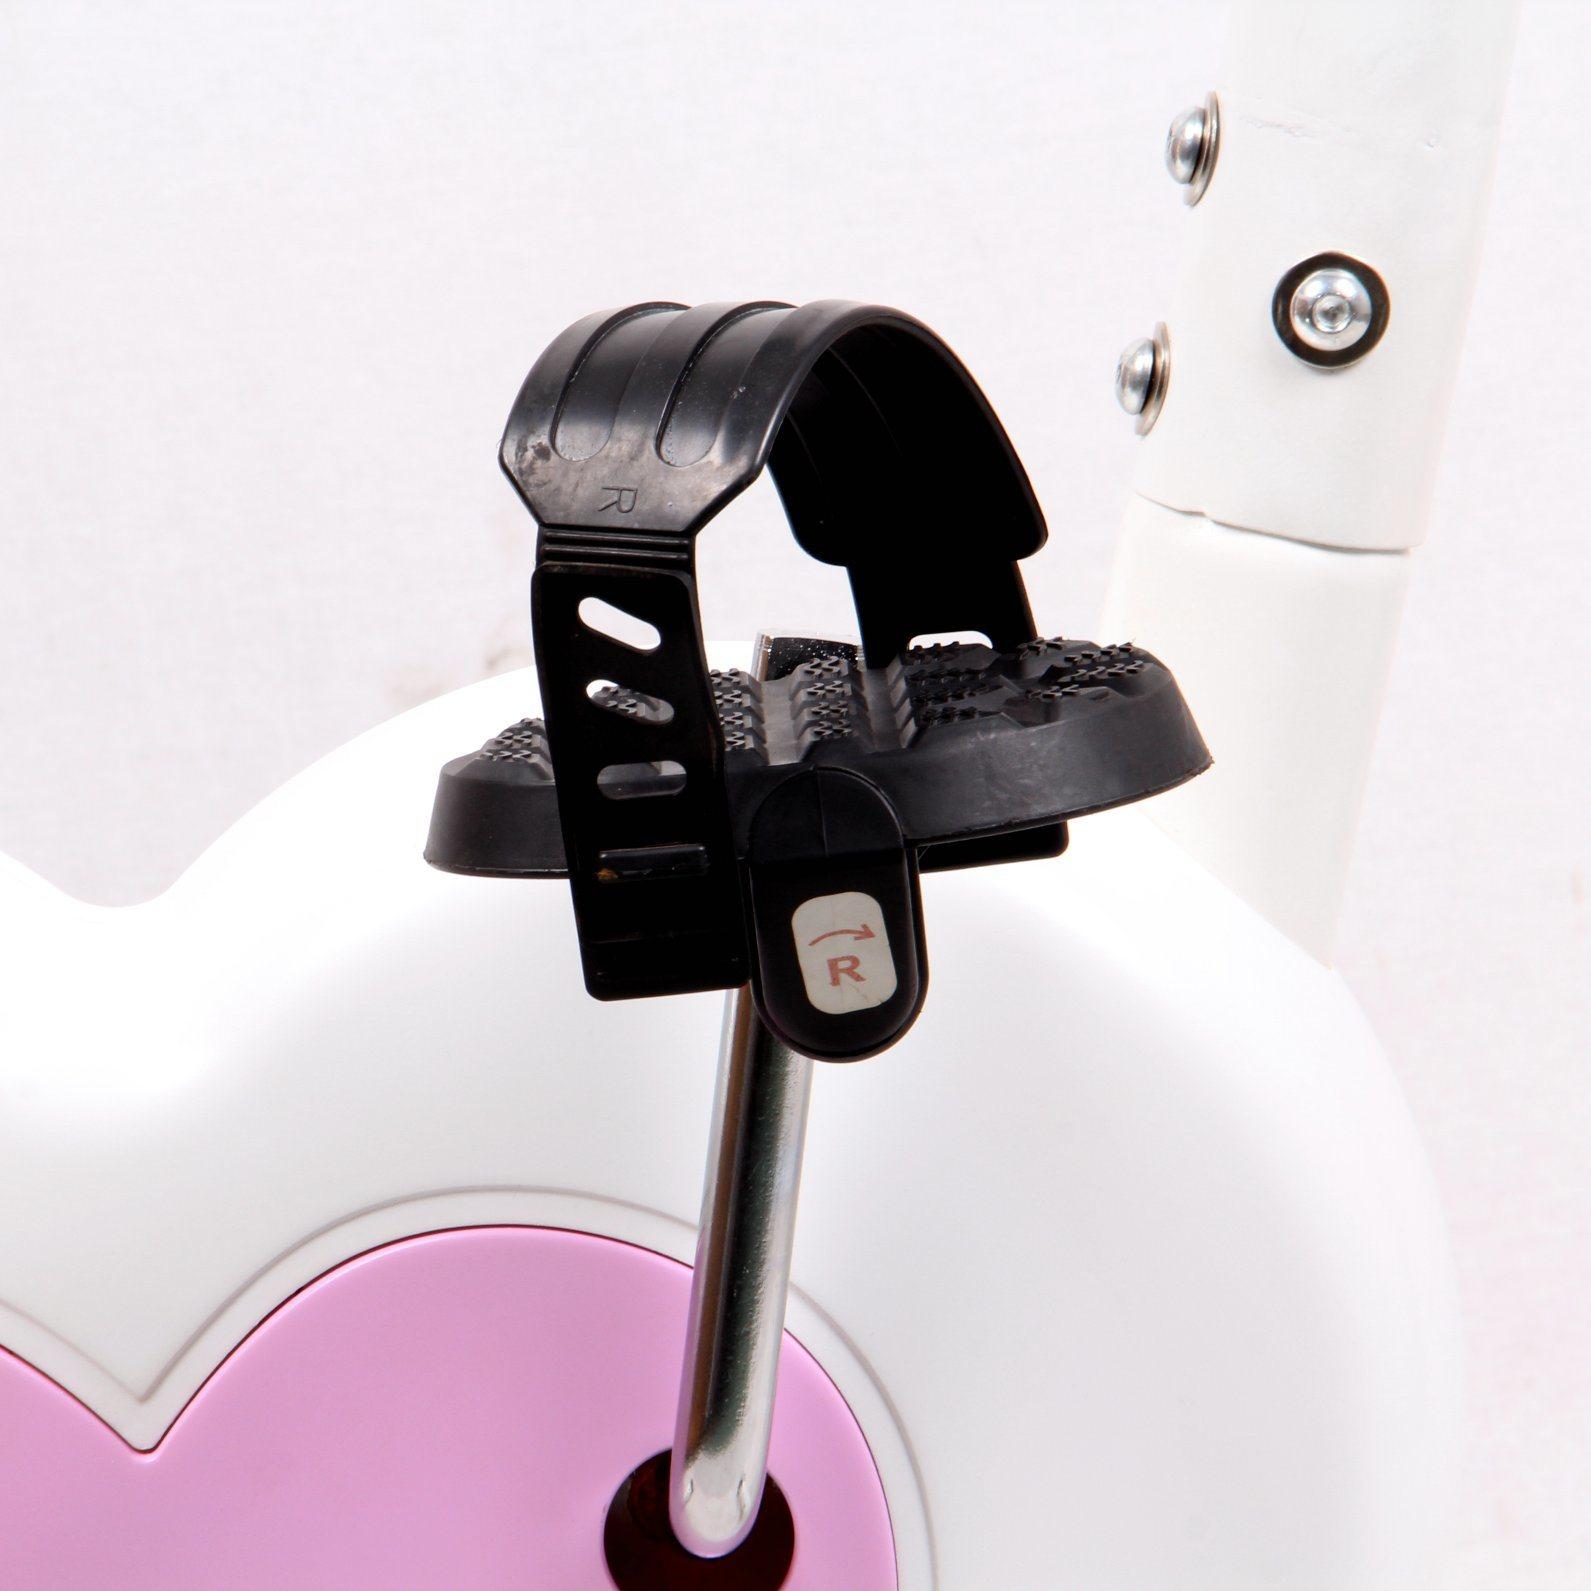 2017 New Design Sports Machine Heart-Shaped Exercise Bike Fitness Equipment